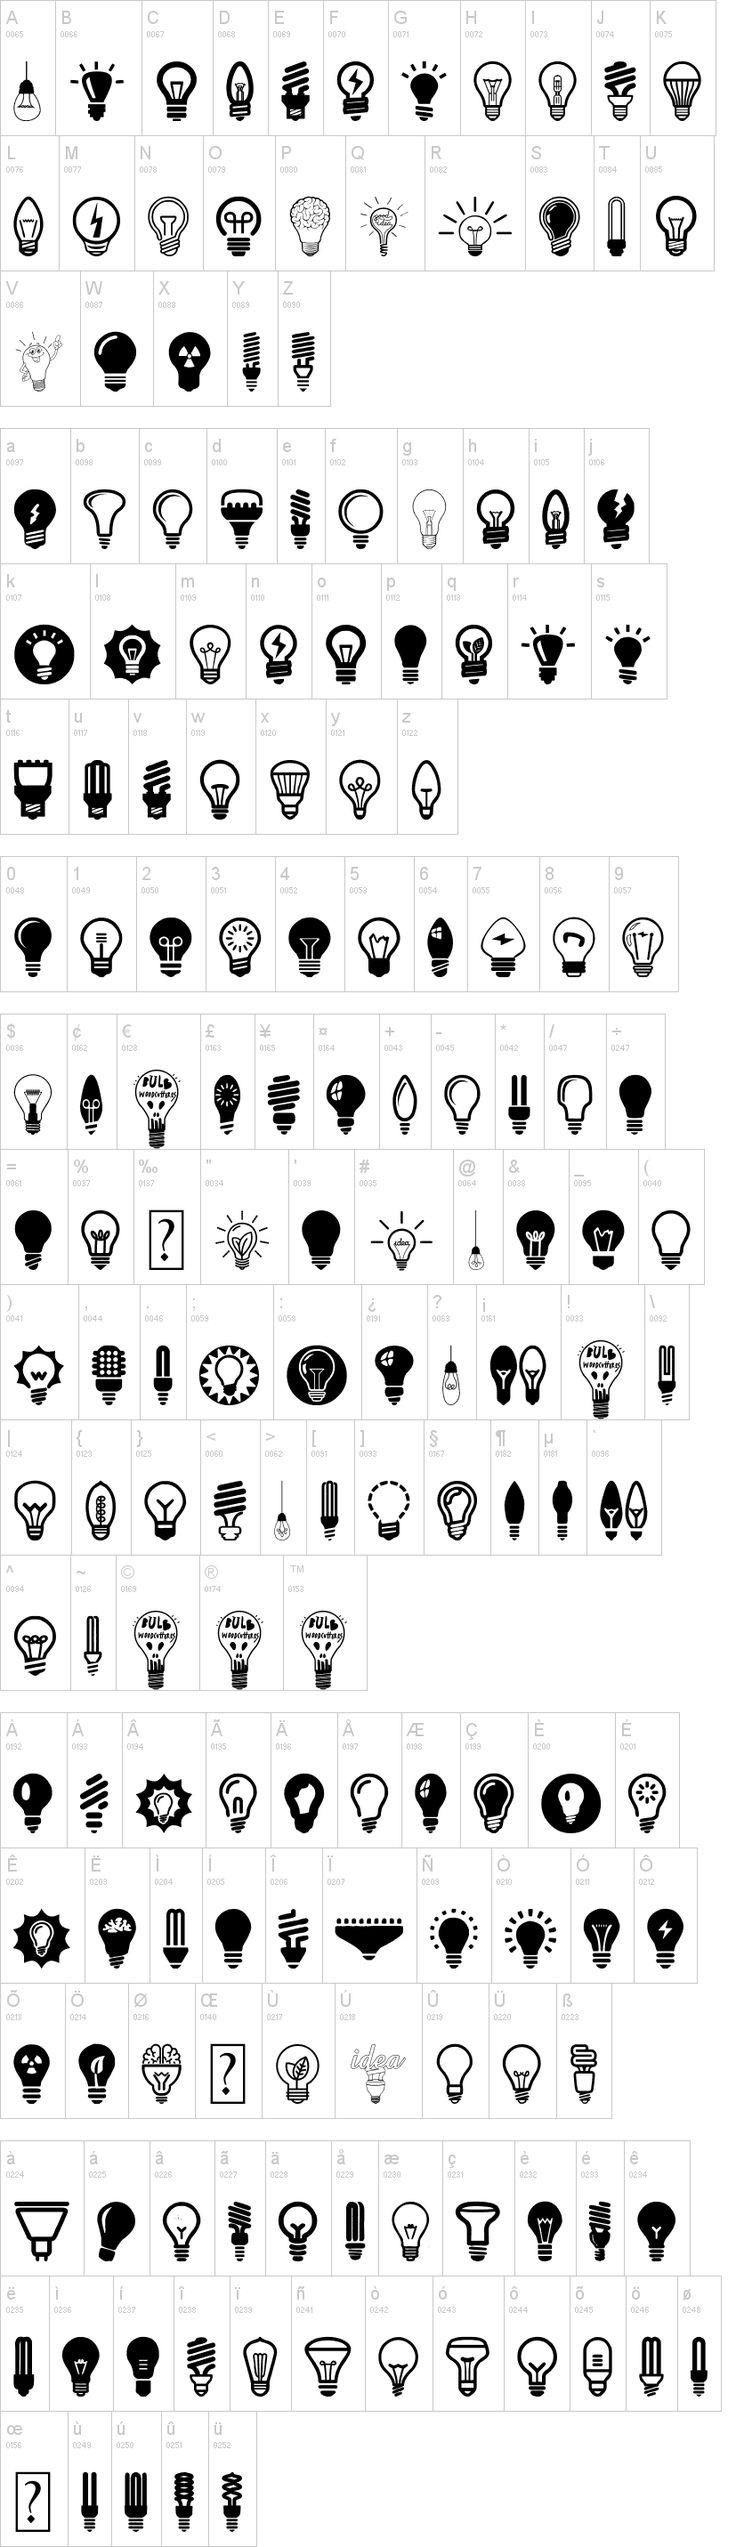 Bulbs Font Lightbulb tattoo, Light icon